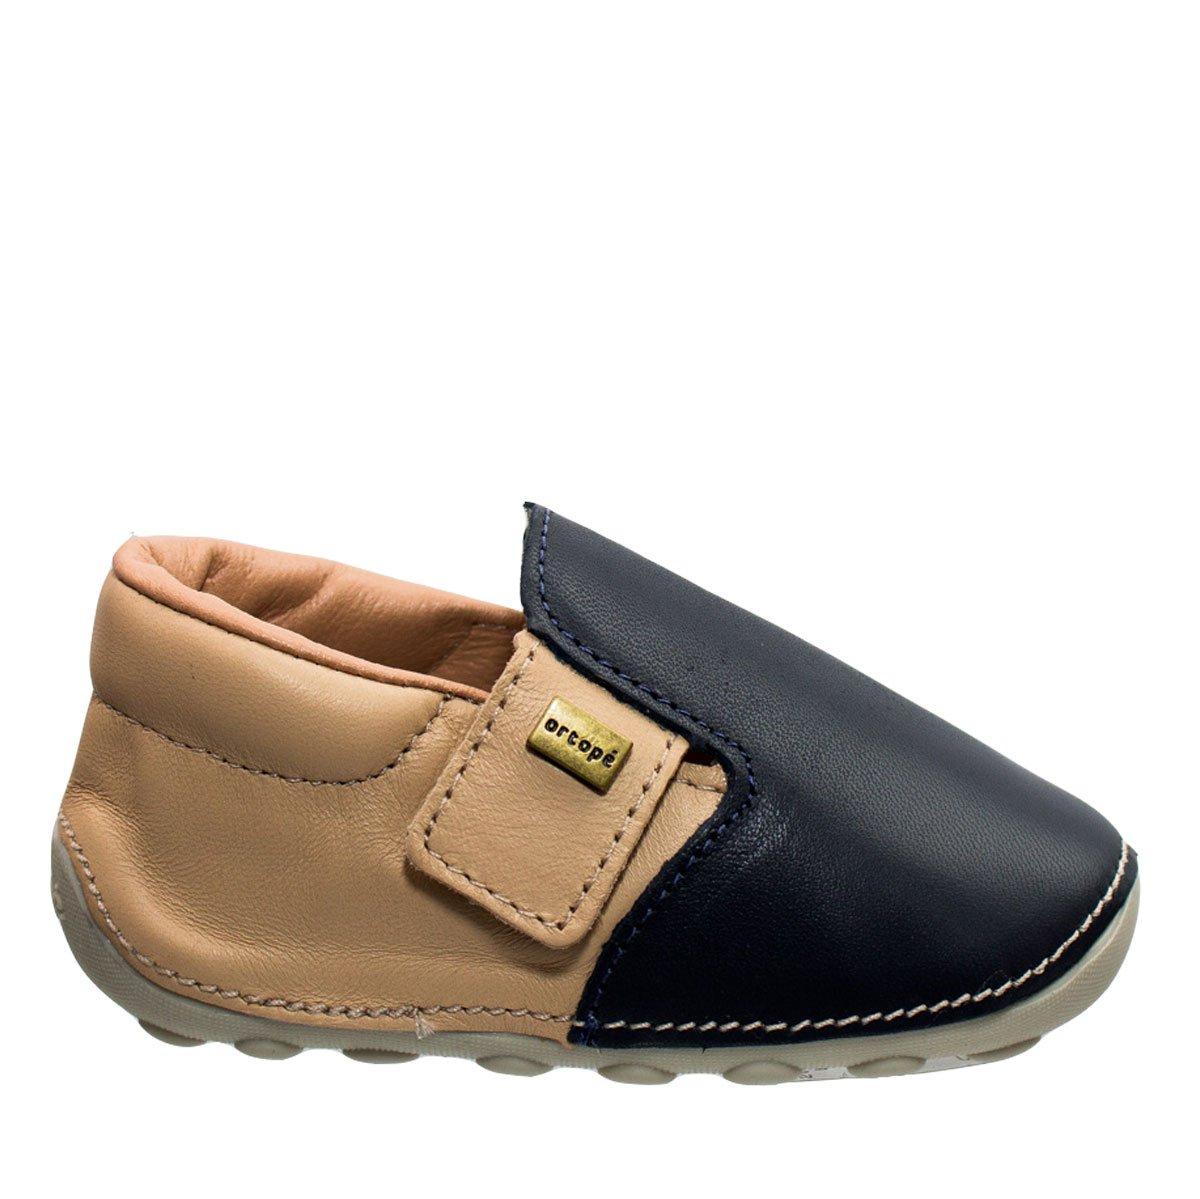 bb93b46547 Bizz Store - Sapato Bebê Menino Ortopé Primeiros Passos Couro